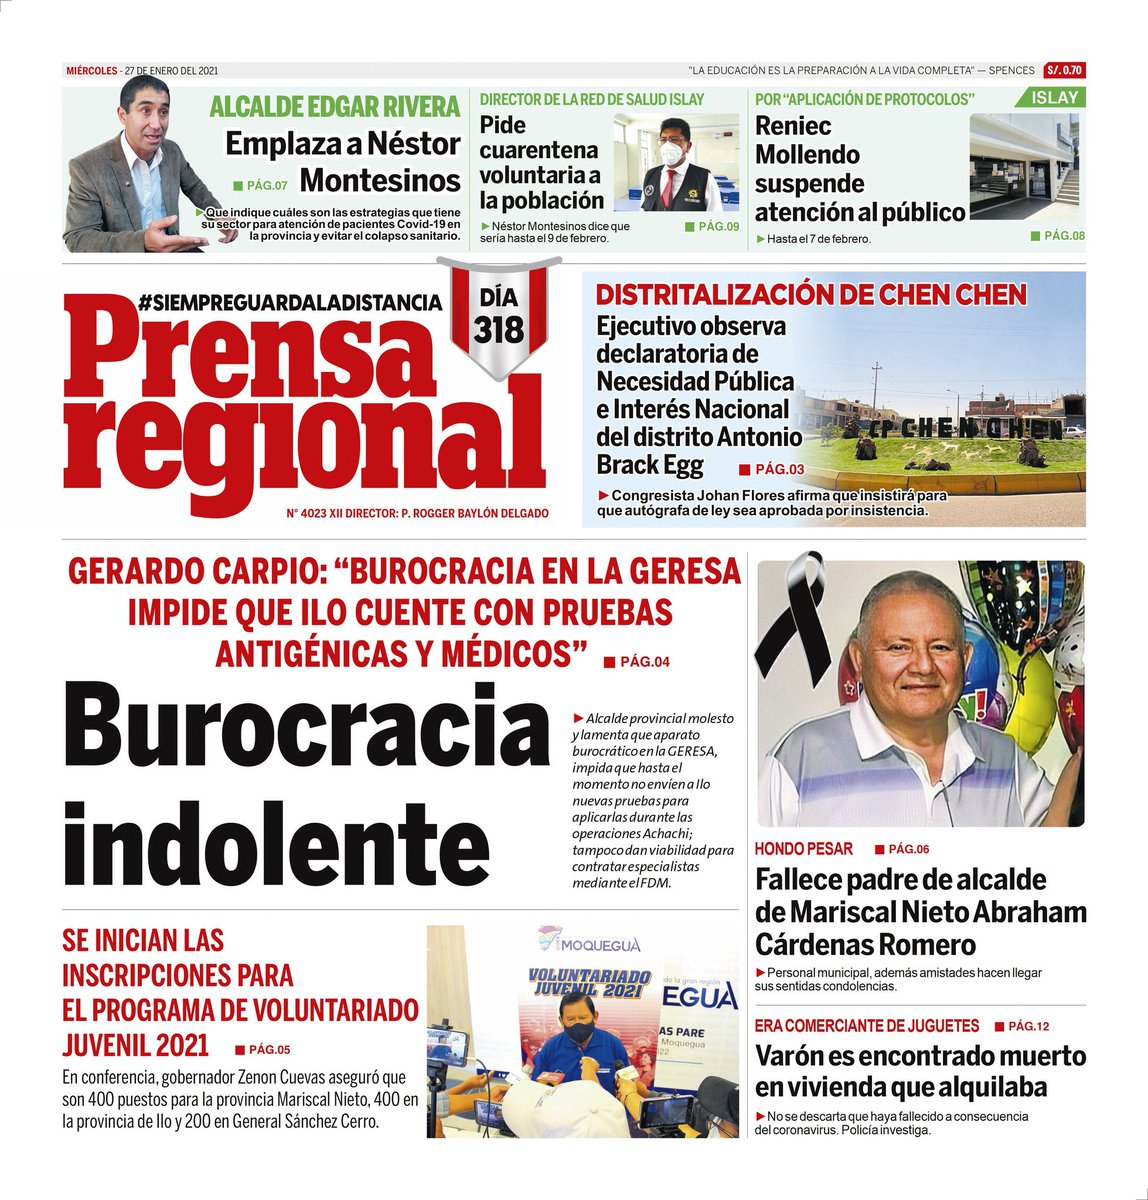 Diario Prensa Regional #Moquegua #Ilo #Mollendo #Islay #Arequipa #LoUltimo  #coronavirus Más información en:  https://t.co/kV0ONv36YM https://t.co/yiPl6HeLqu